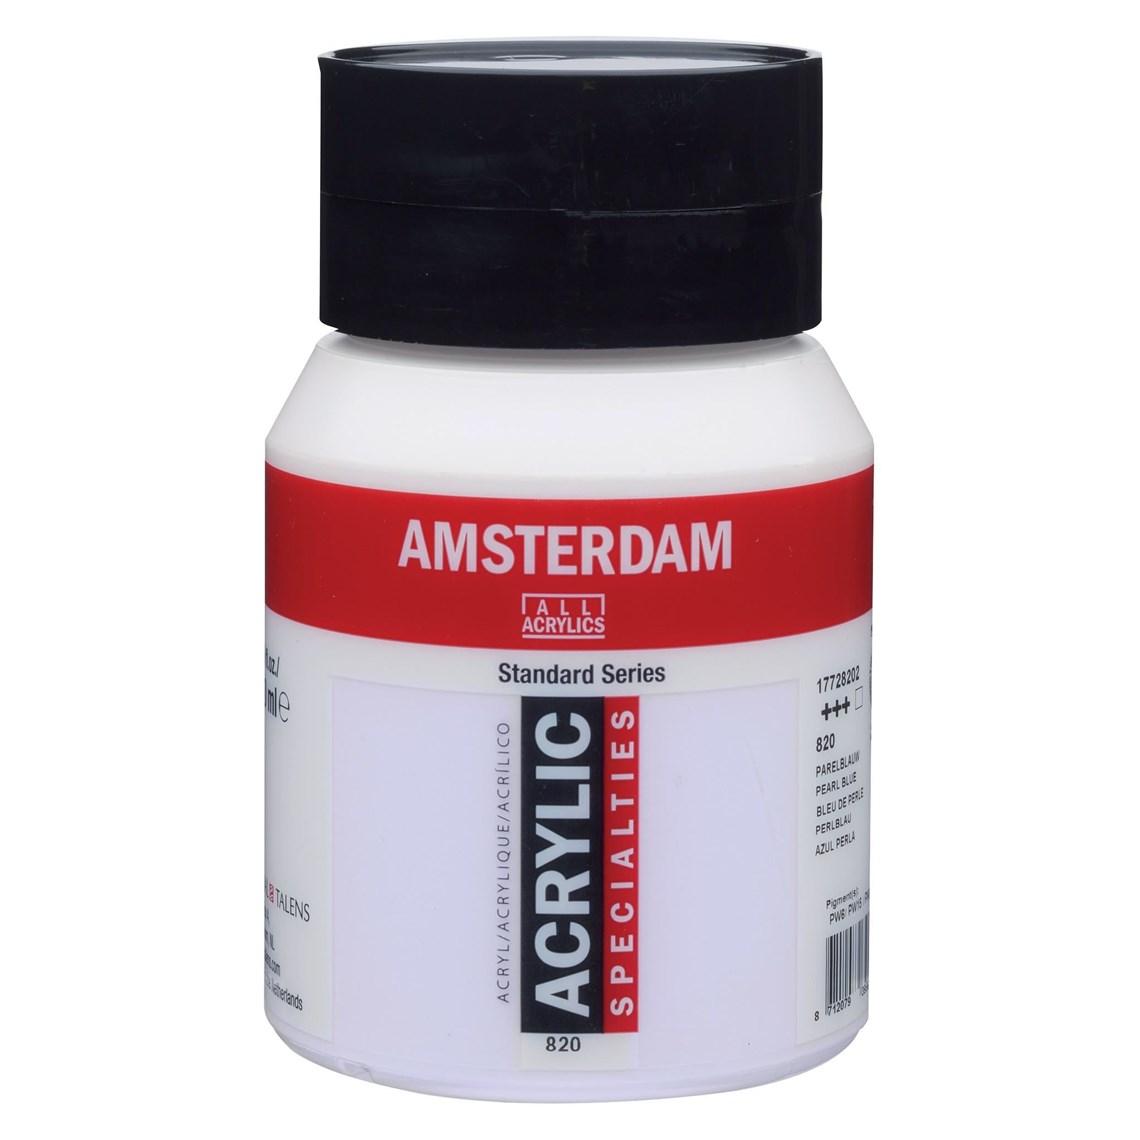 Amsterdam Acryl Parelblauw 820 specialties Angelart Kunst en zo